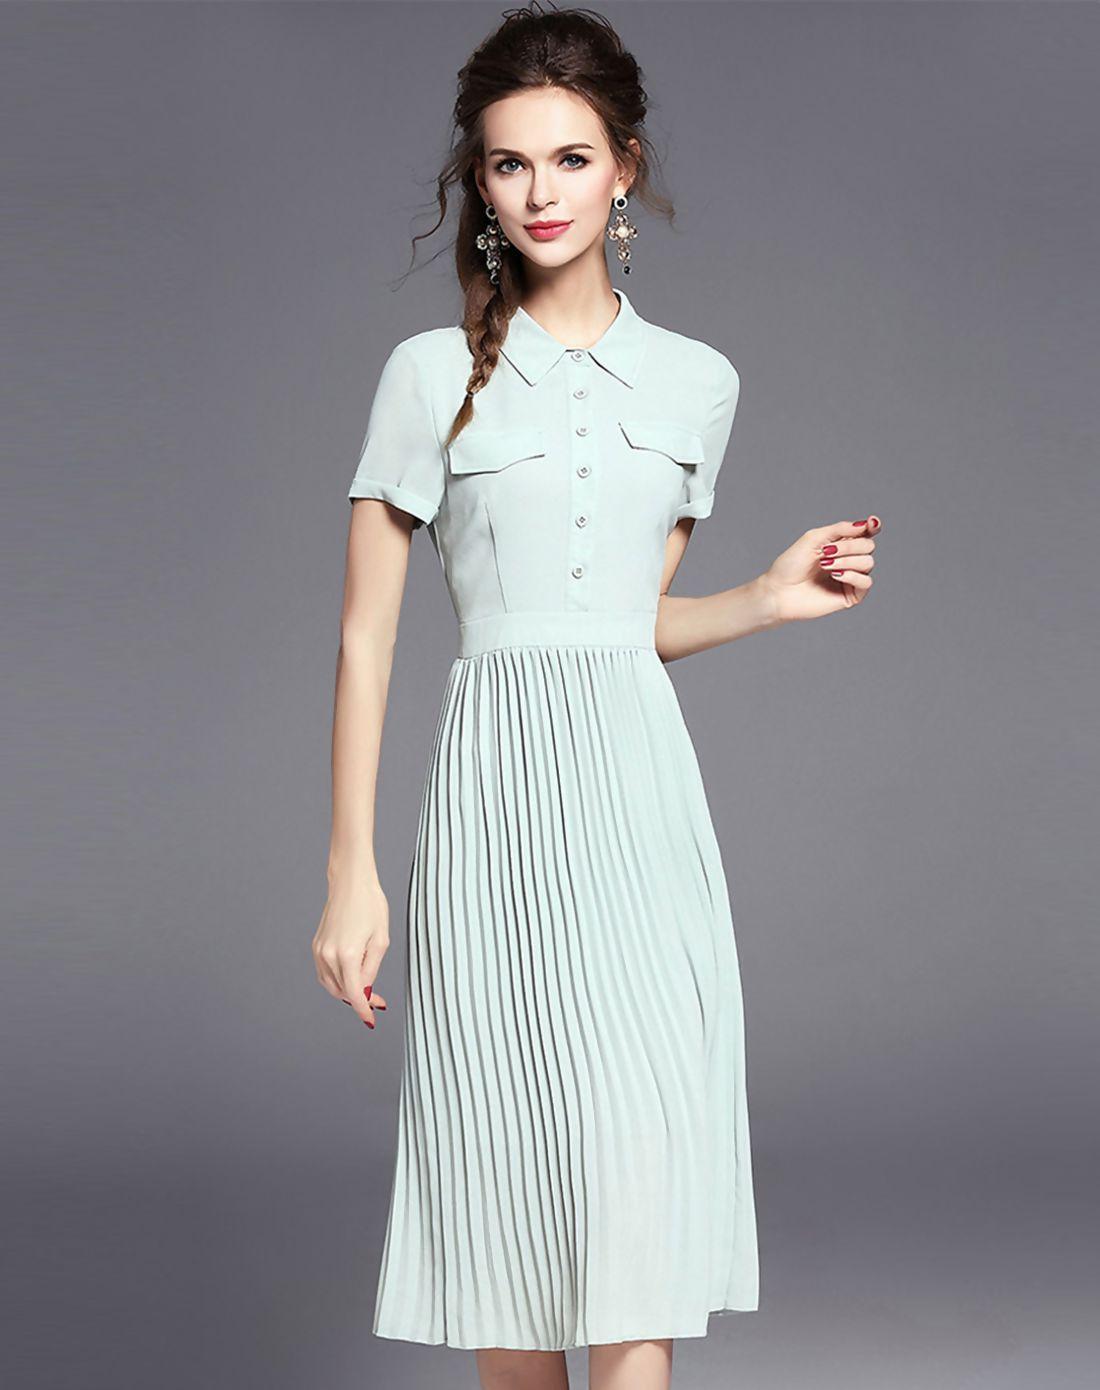 Adorewe vipme aline dressesdesigner fan shang alice blue stand